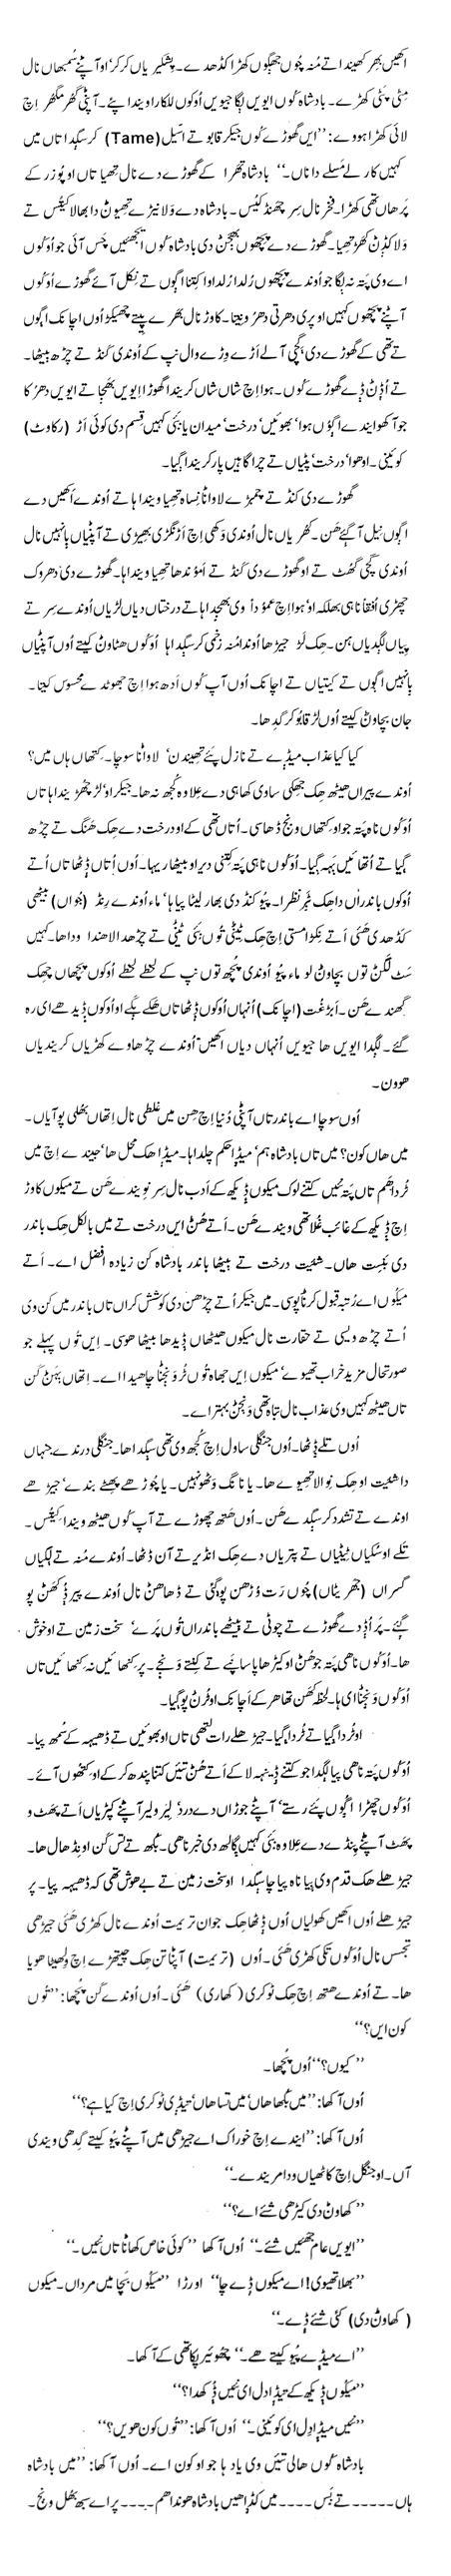 Seraiki Afsana Lawanra (R.K.Narian translator Azhar Lashari) Part-2